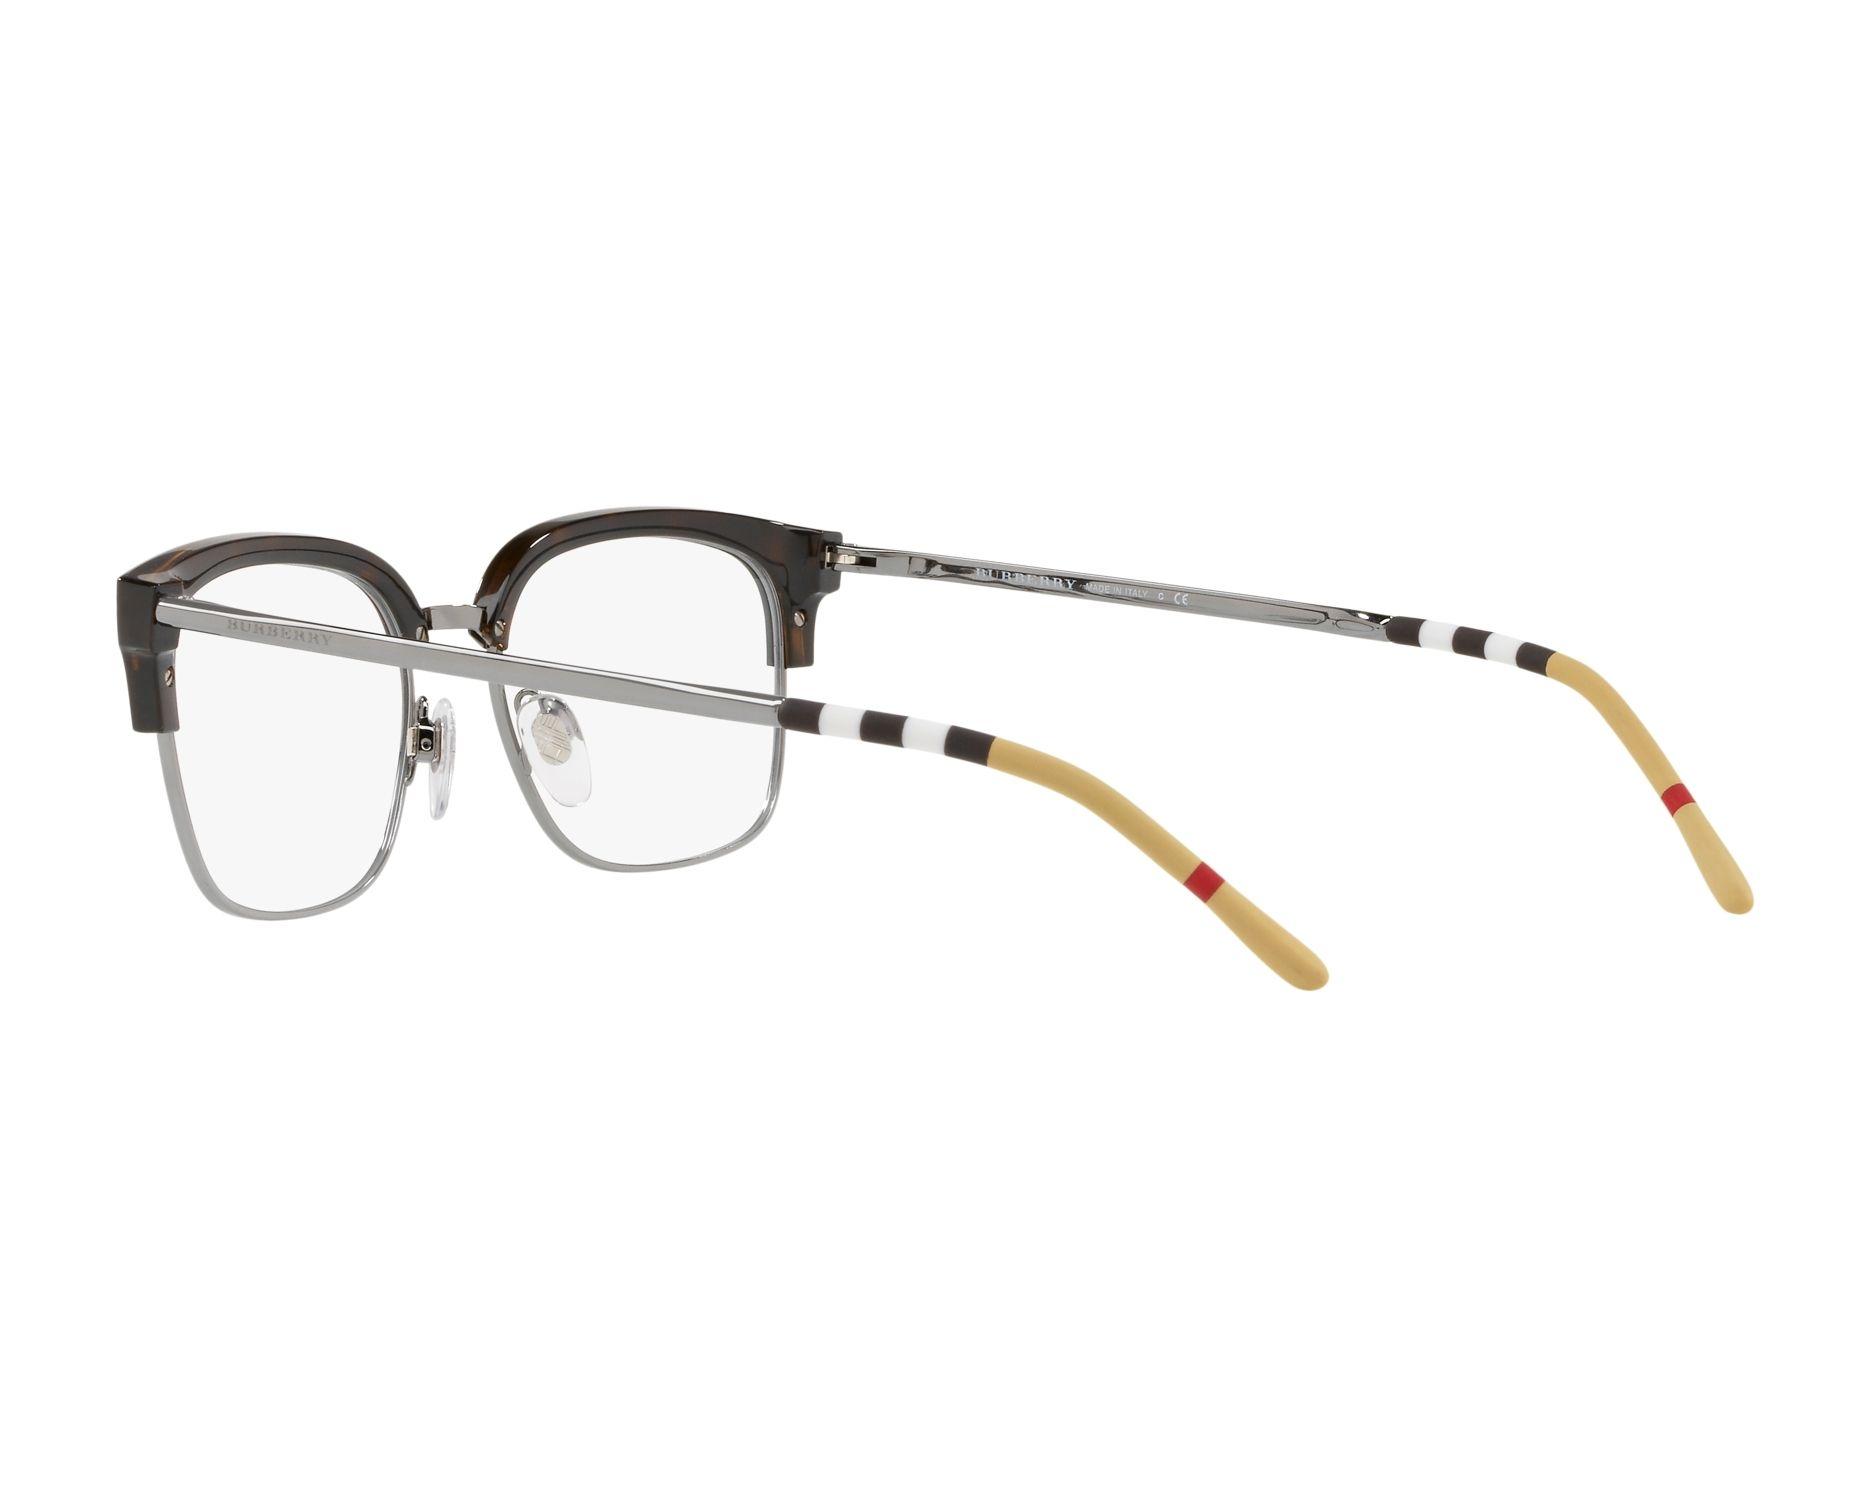 eyeglasses Burberry BE-2273 3002 54-18 Havana Gun 360 degree view 5